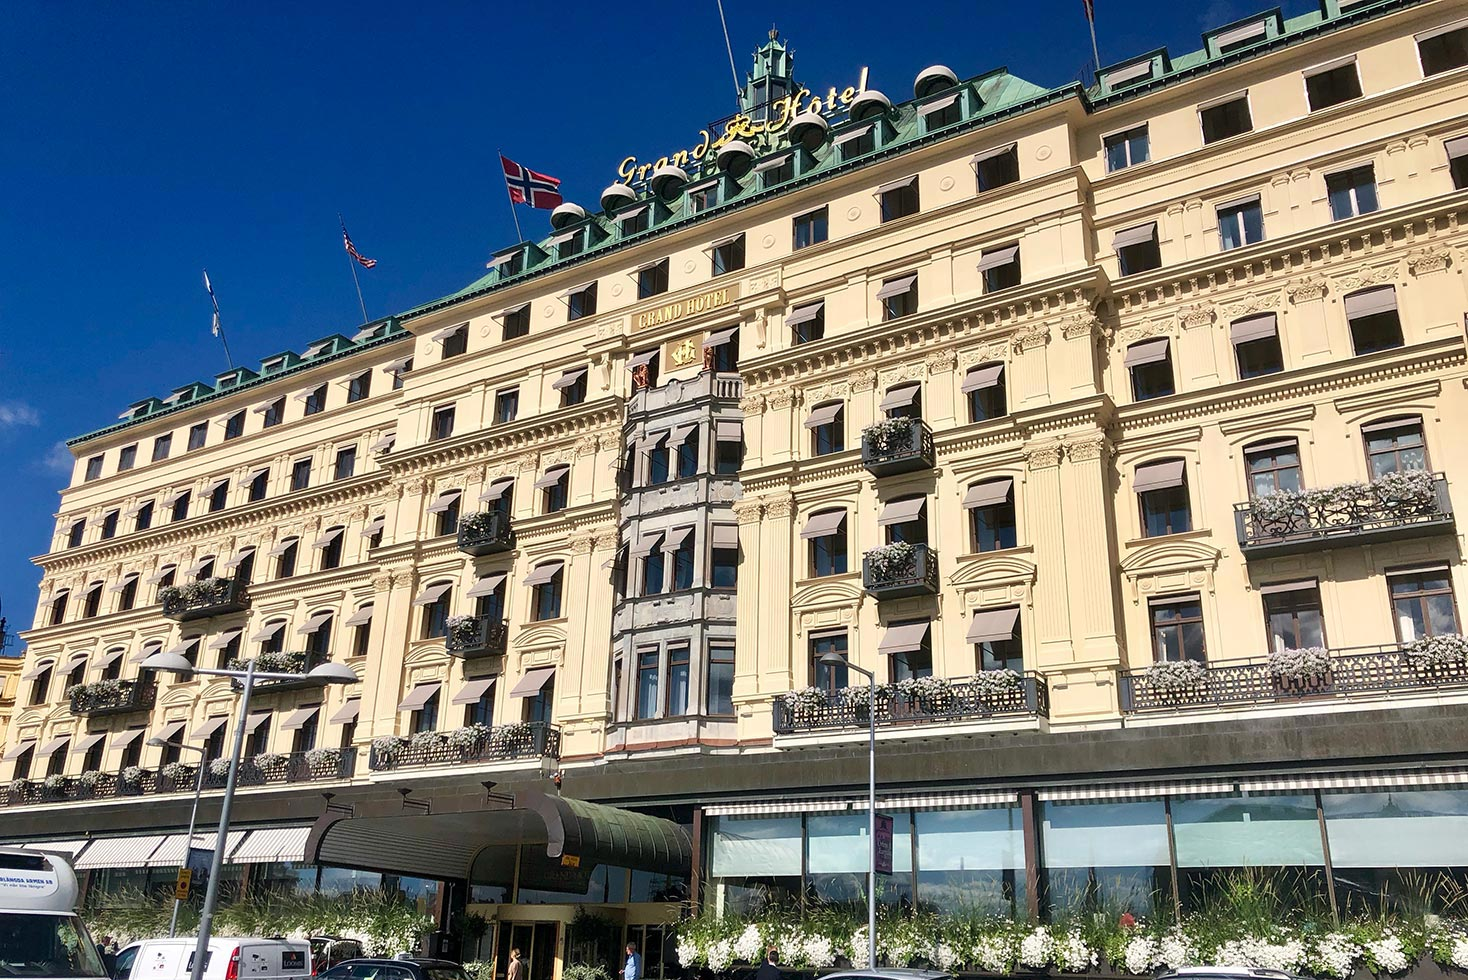 grand hotel stockholm solavskarmning